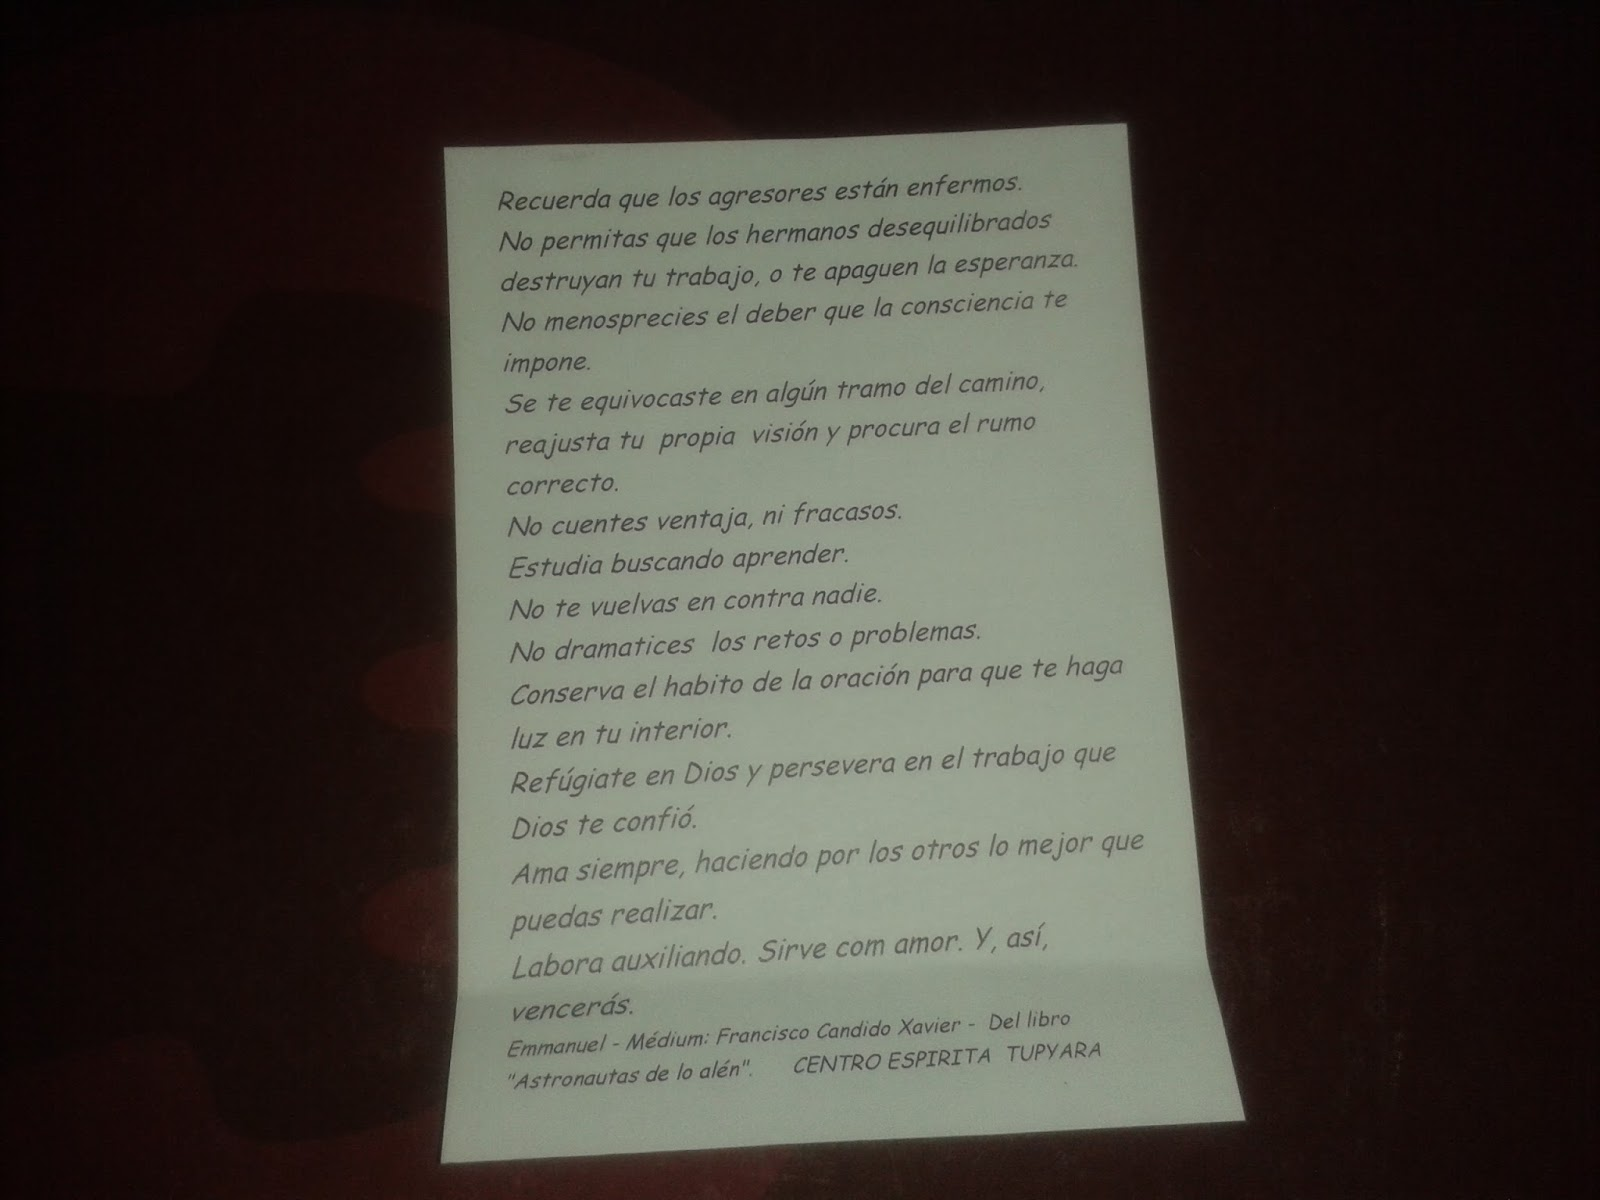 Carta A Los Monjes Tupyara